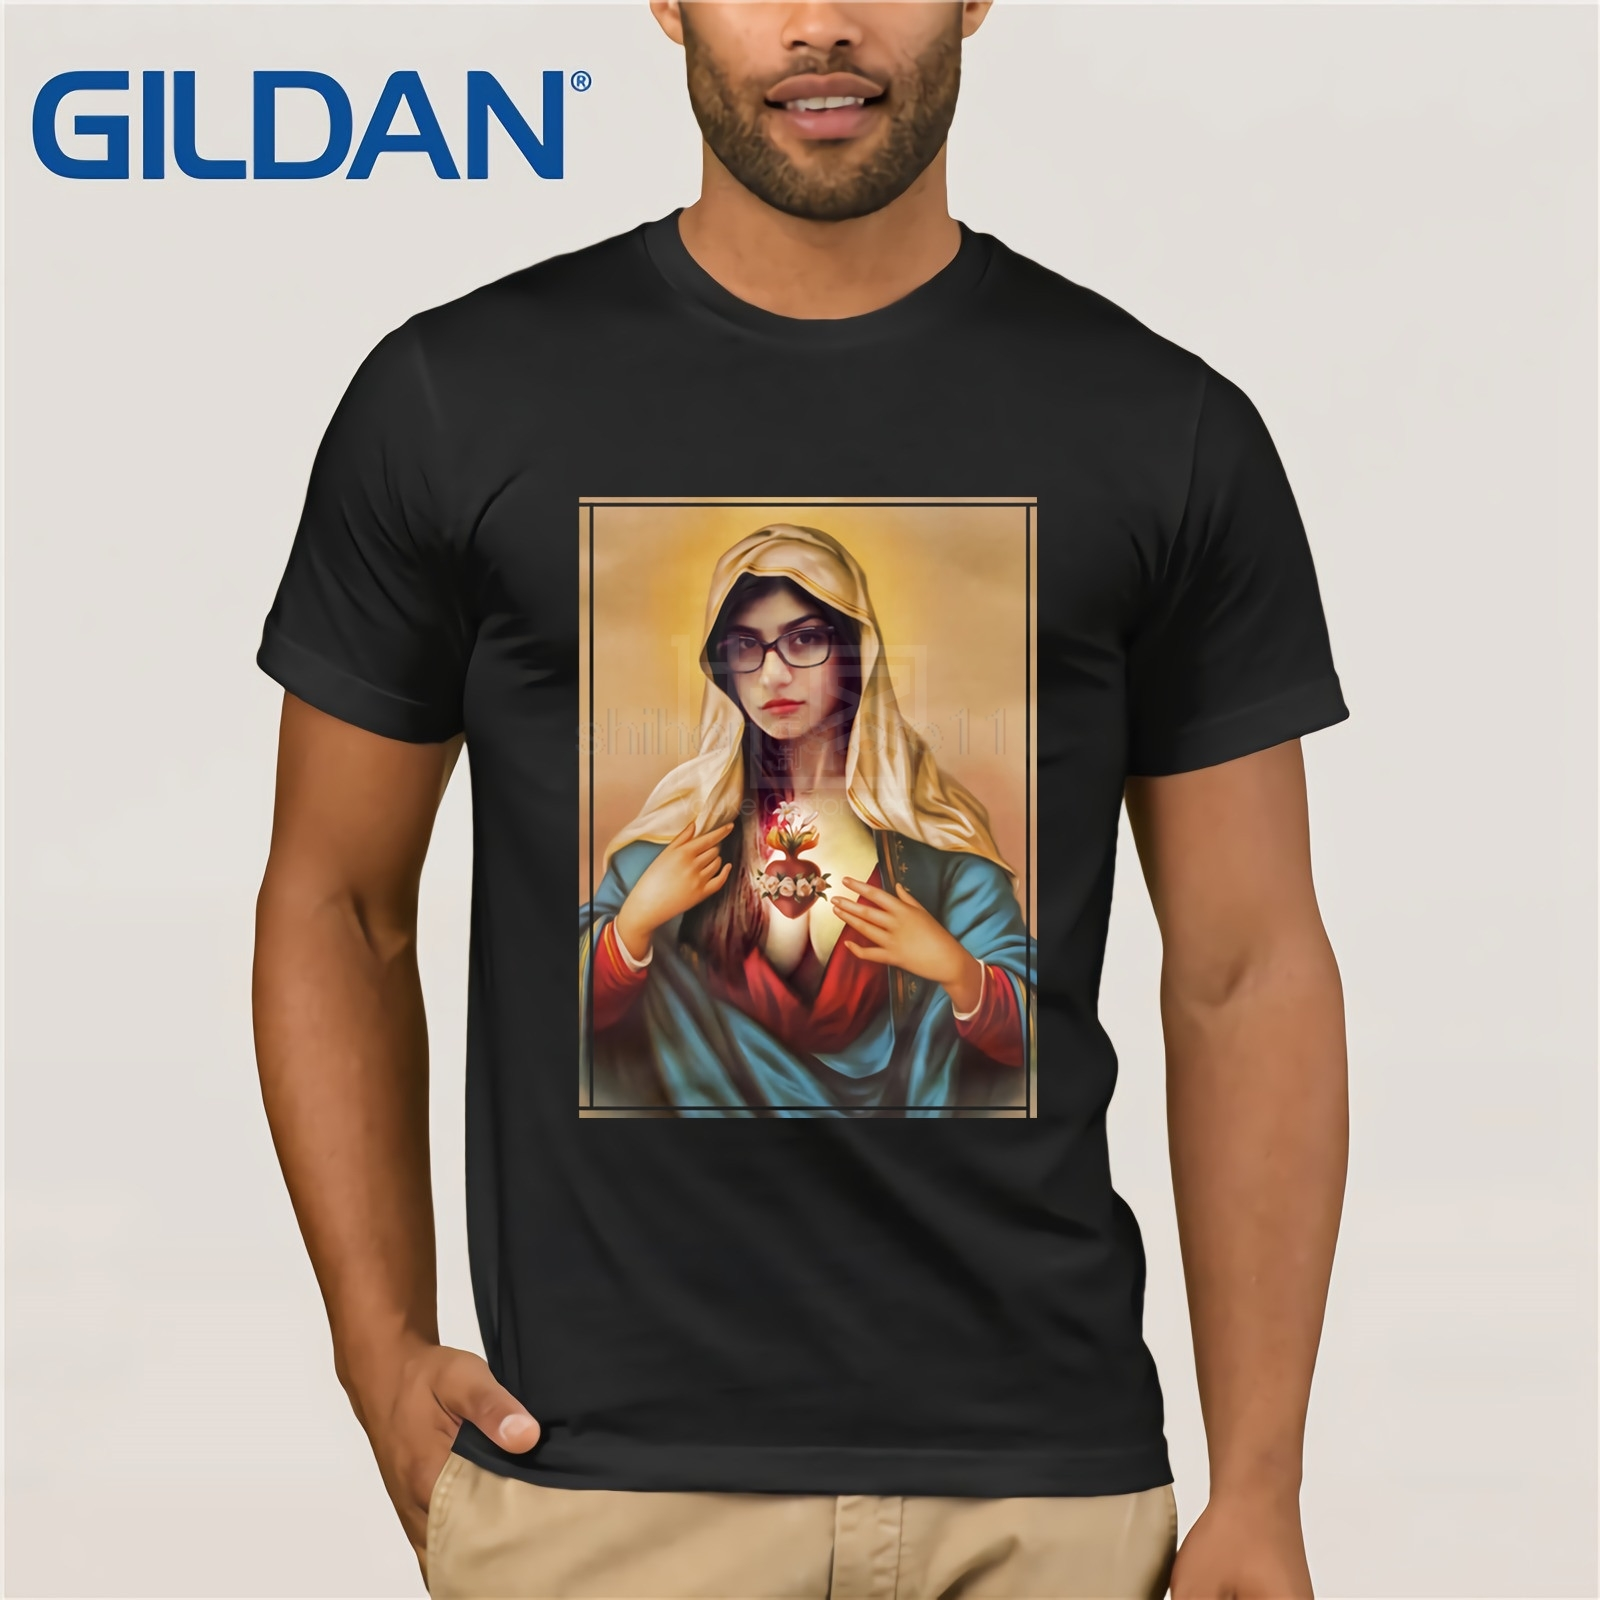 2019 New Summer T-shirt Virgin Mia Khalifa T-Shirt Creative Harajuku Hip Hop Funny Sexy Tee T-shirt